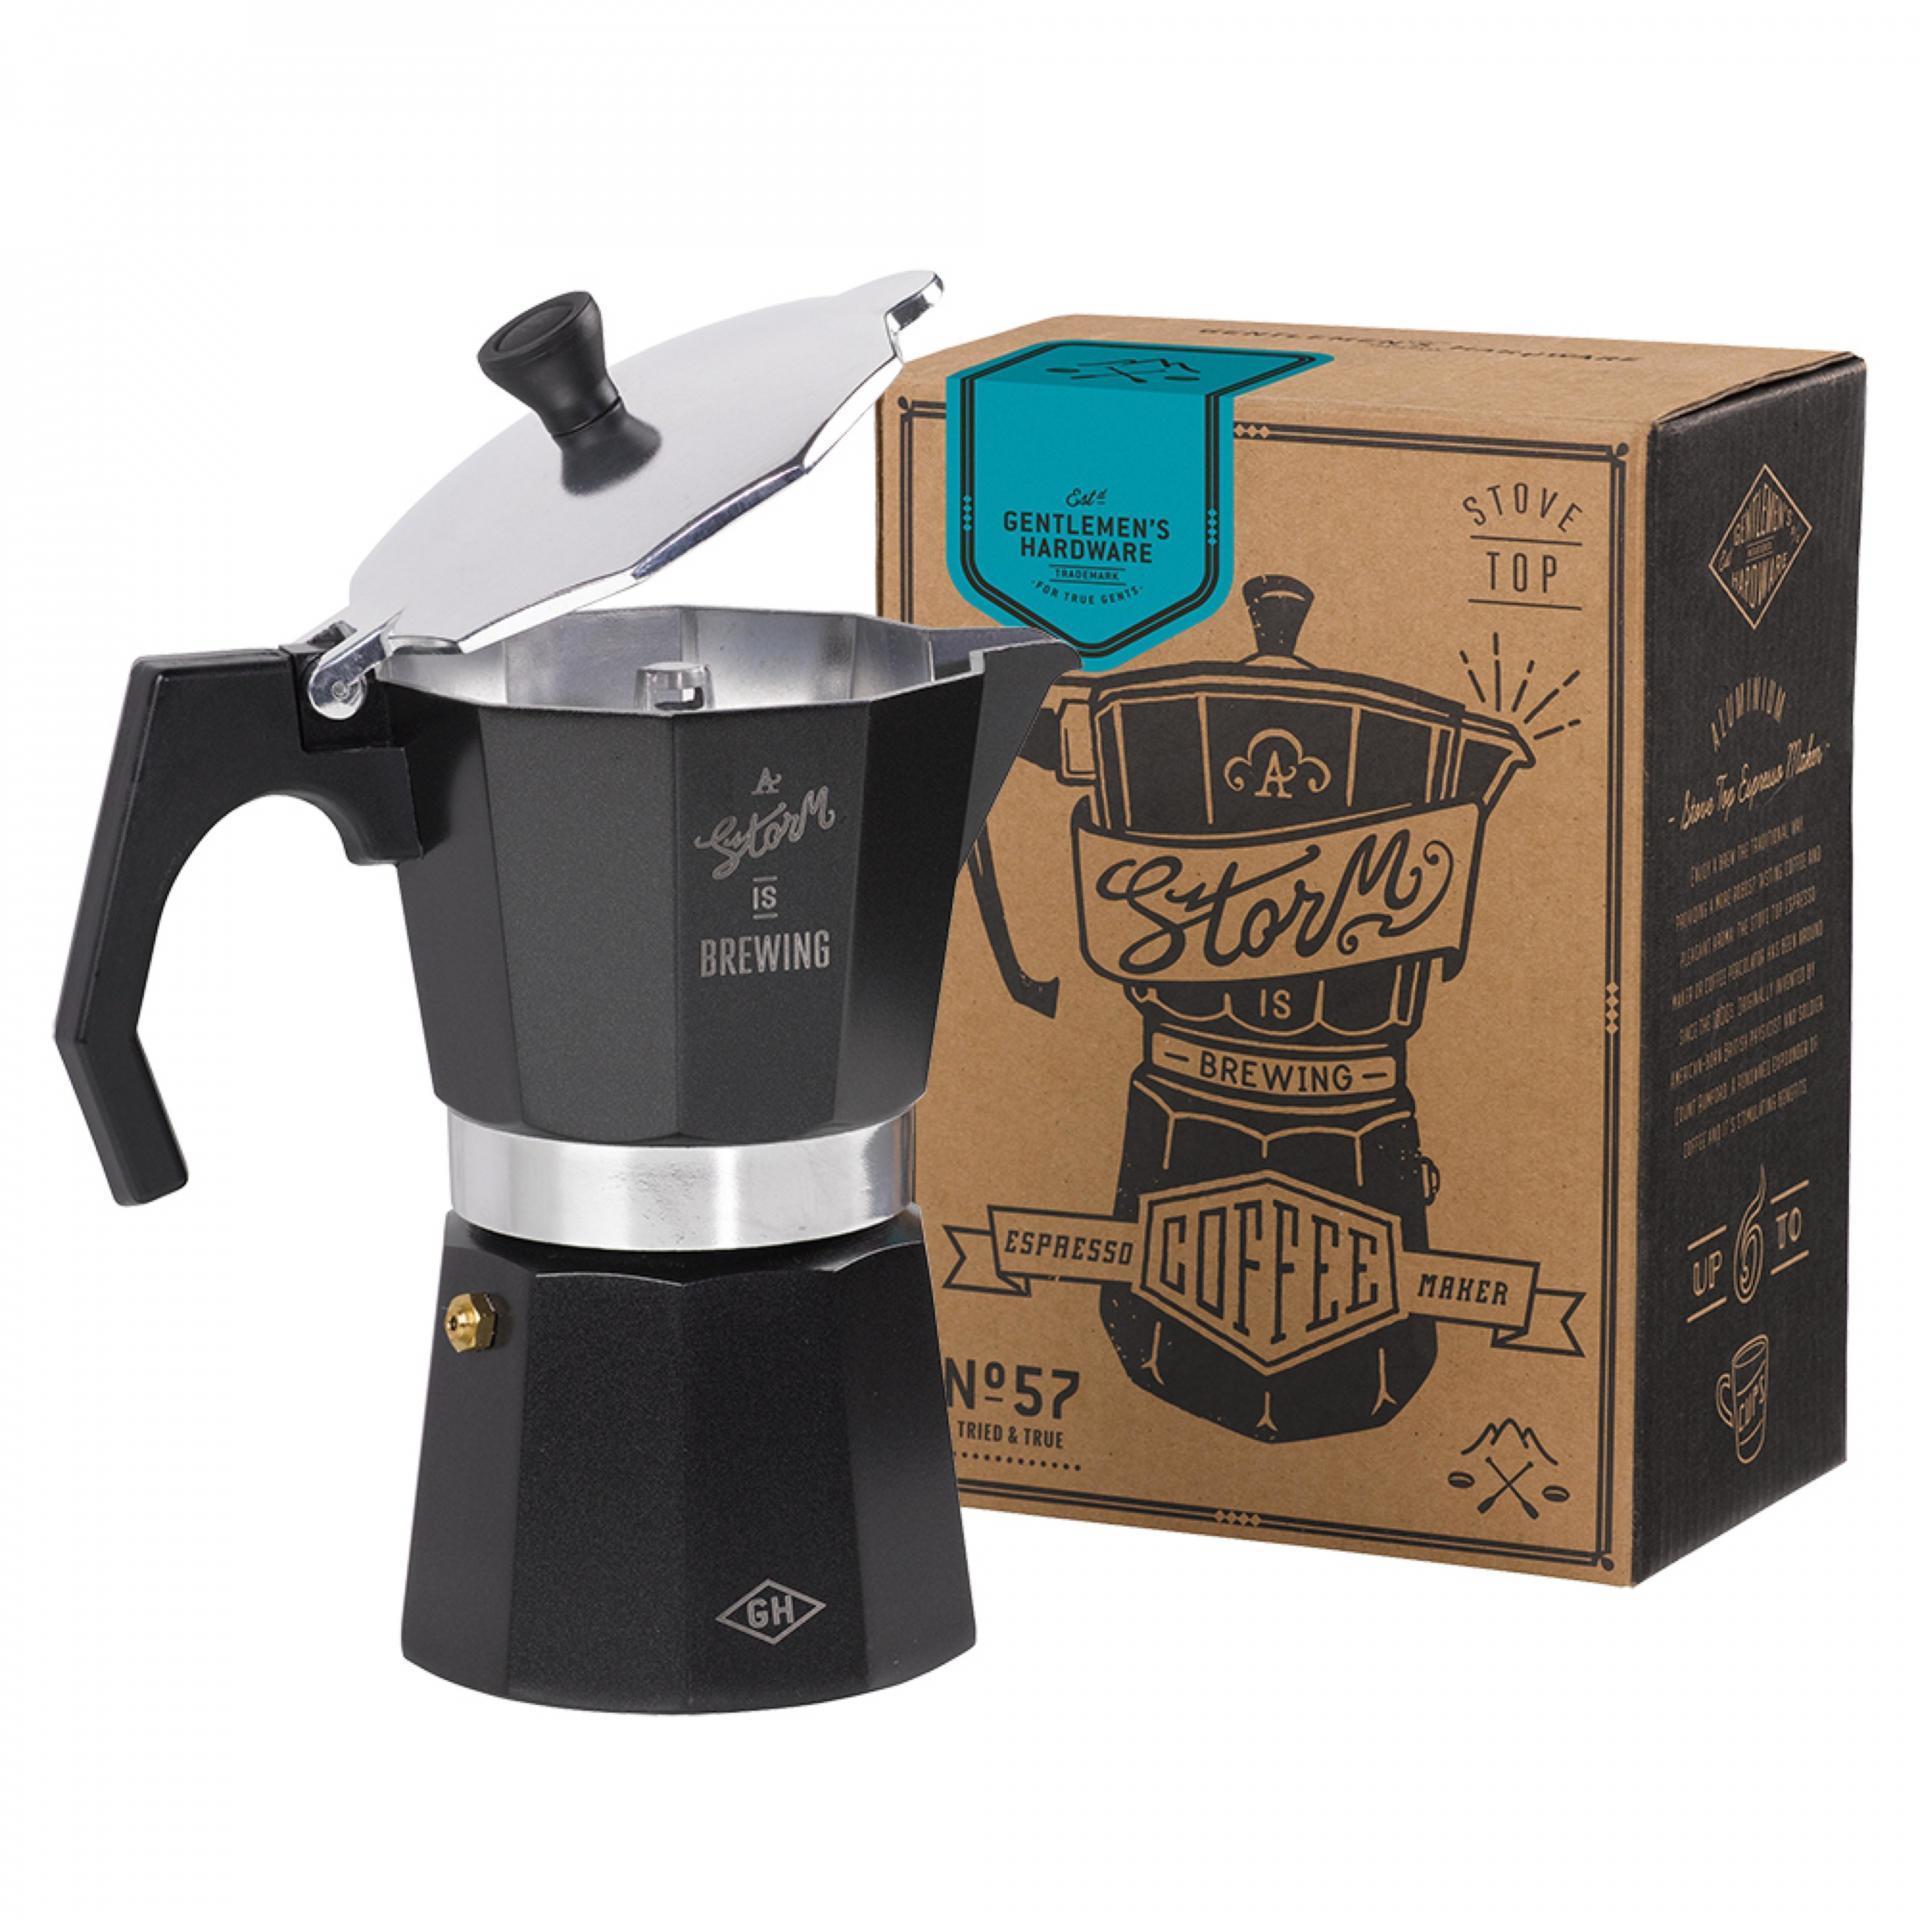 Gentlemen's Hardware Moka konvička na espresso